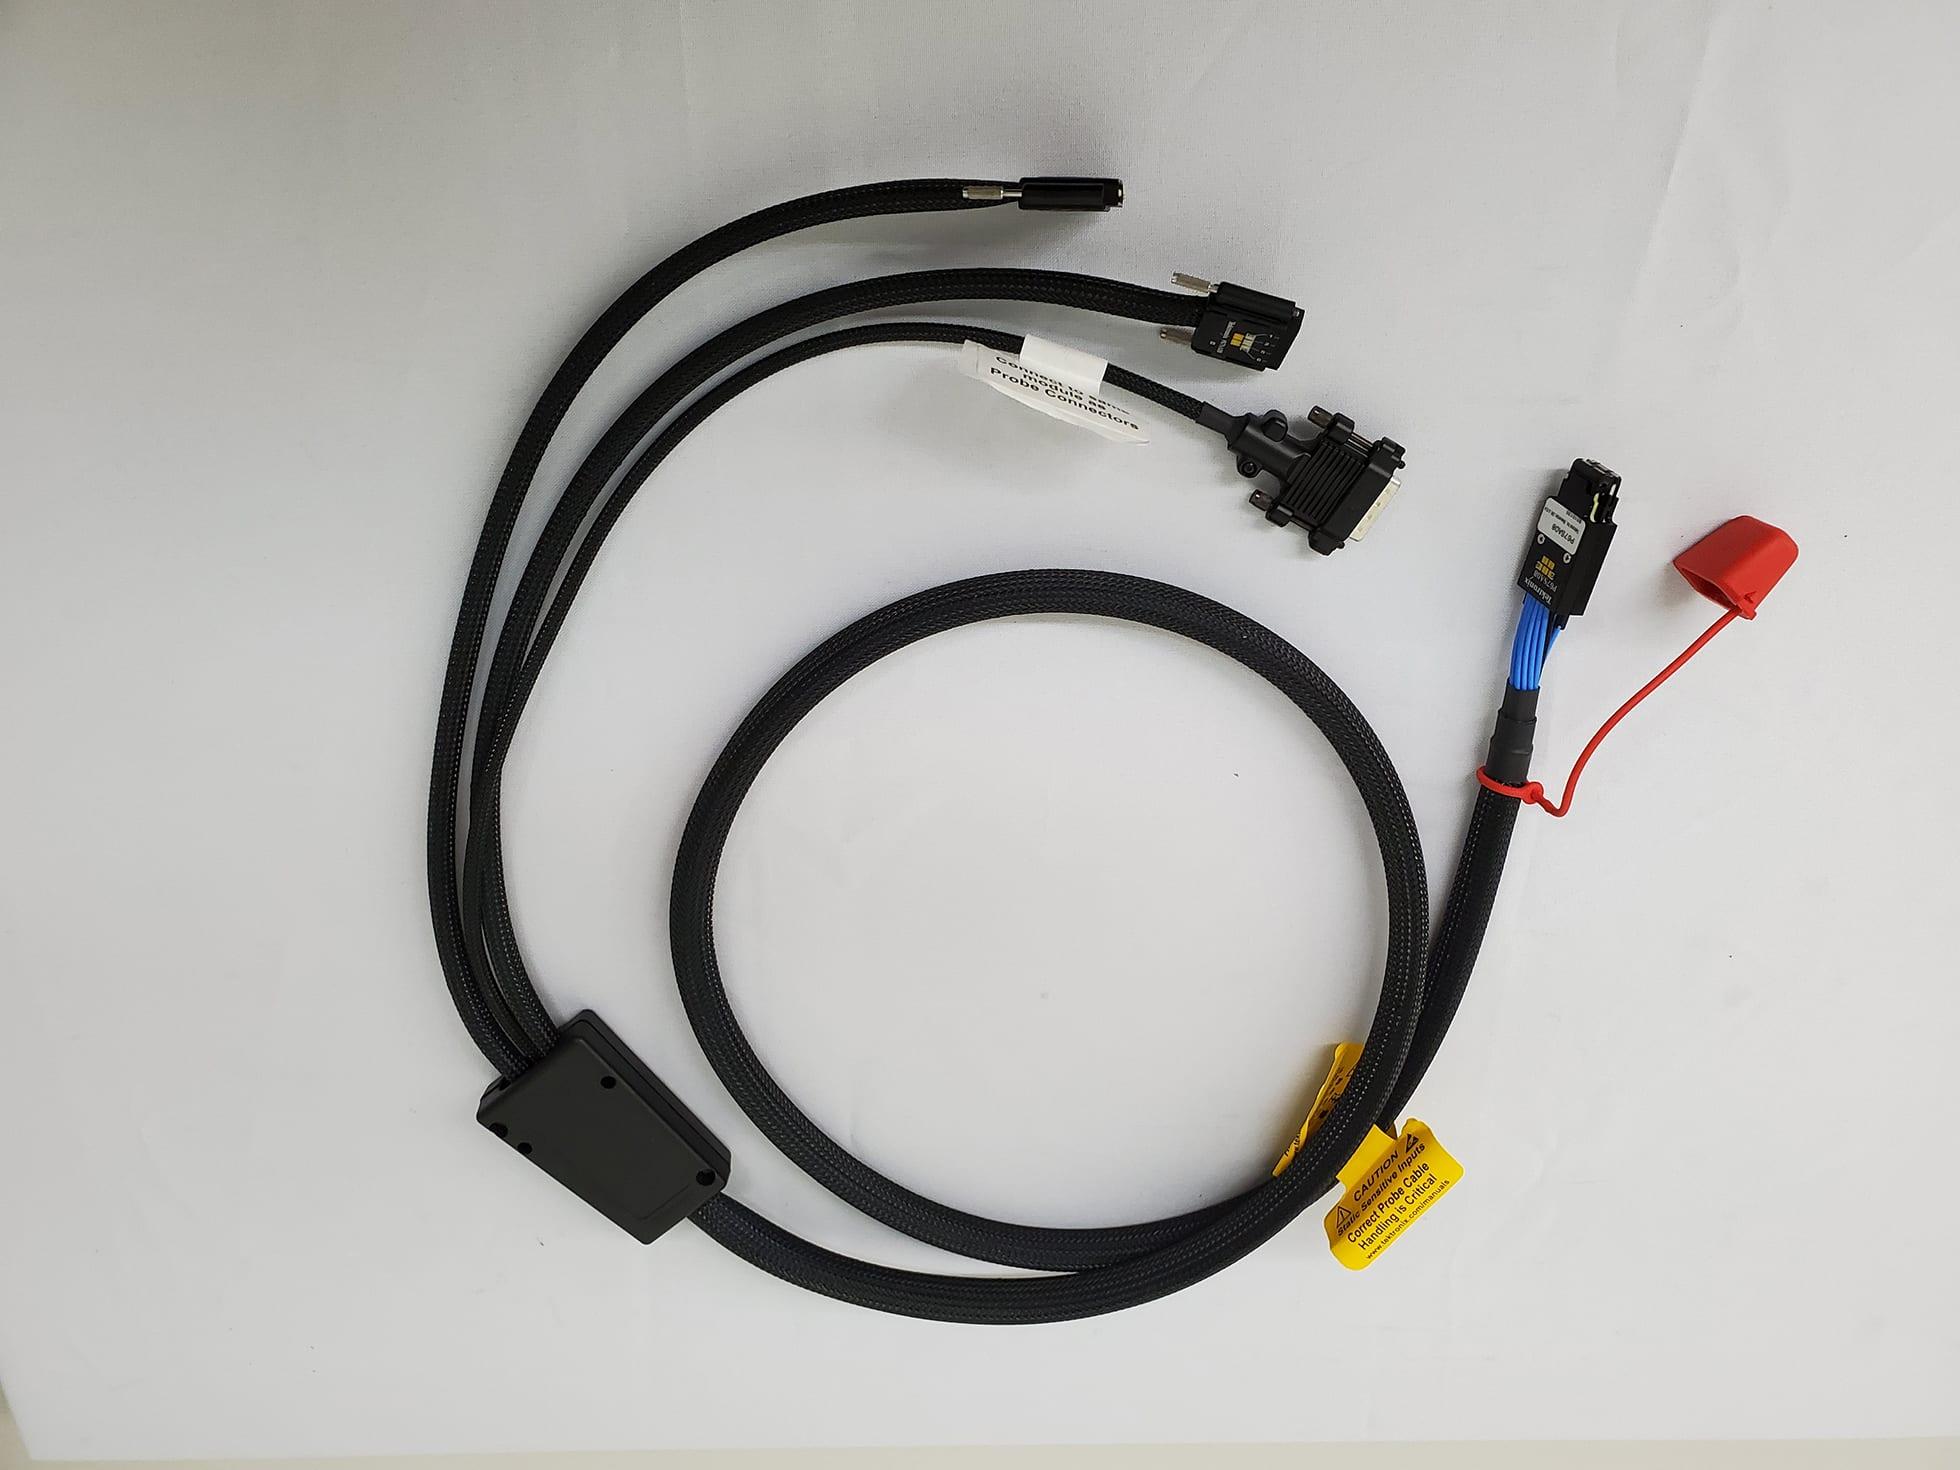 Tektronix P67SA08 4 Midbus Probe For Sale